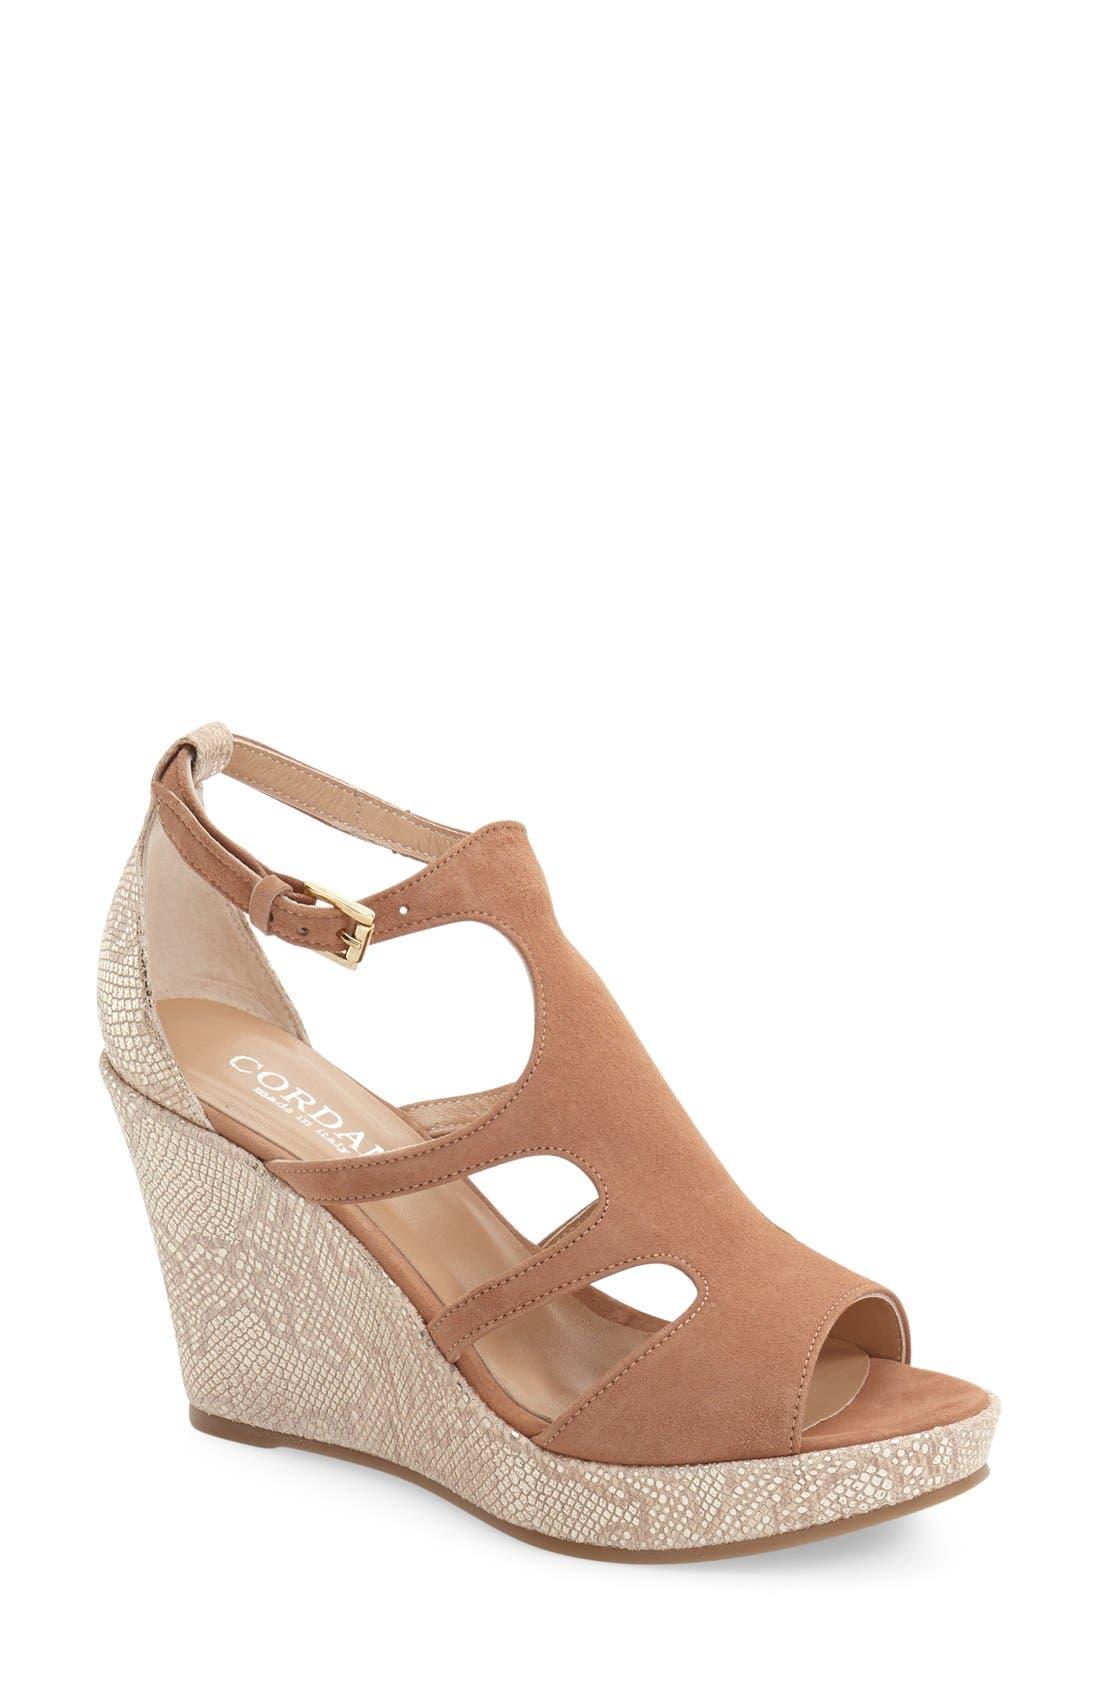 Alternate Image 1 Selected - Cordani 'Lennix' Platform Wedge Sandal (Women)